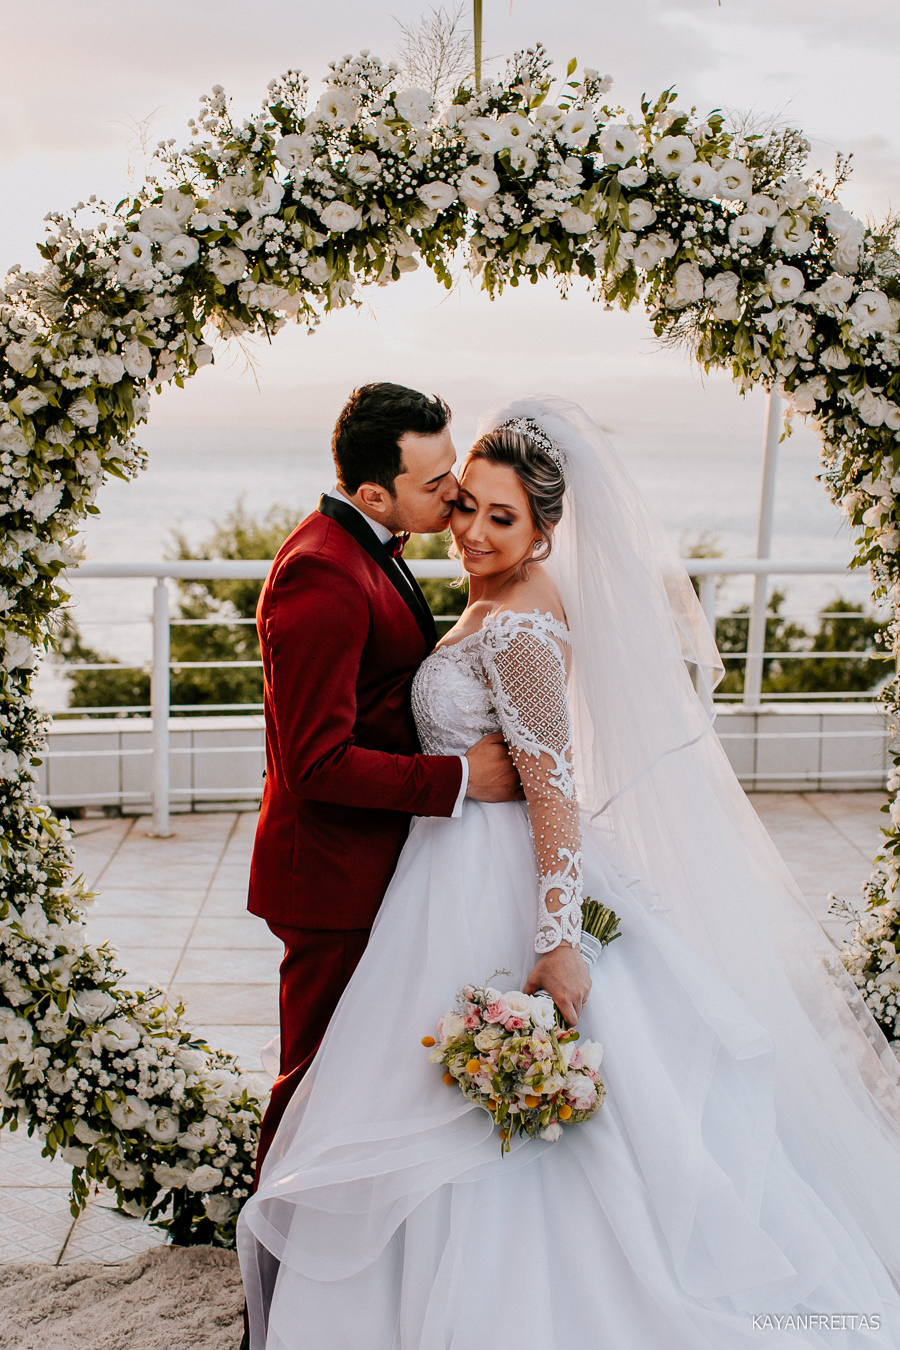 casamento-mariadomar-floripa-0111 Casamento Jéssica e Felipe - Maria do Mar Hotel